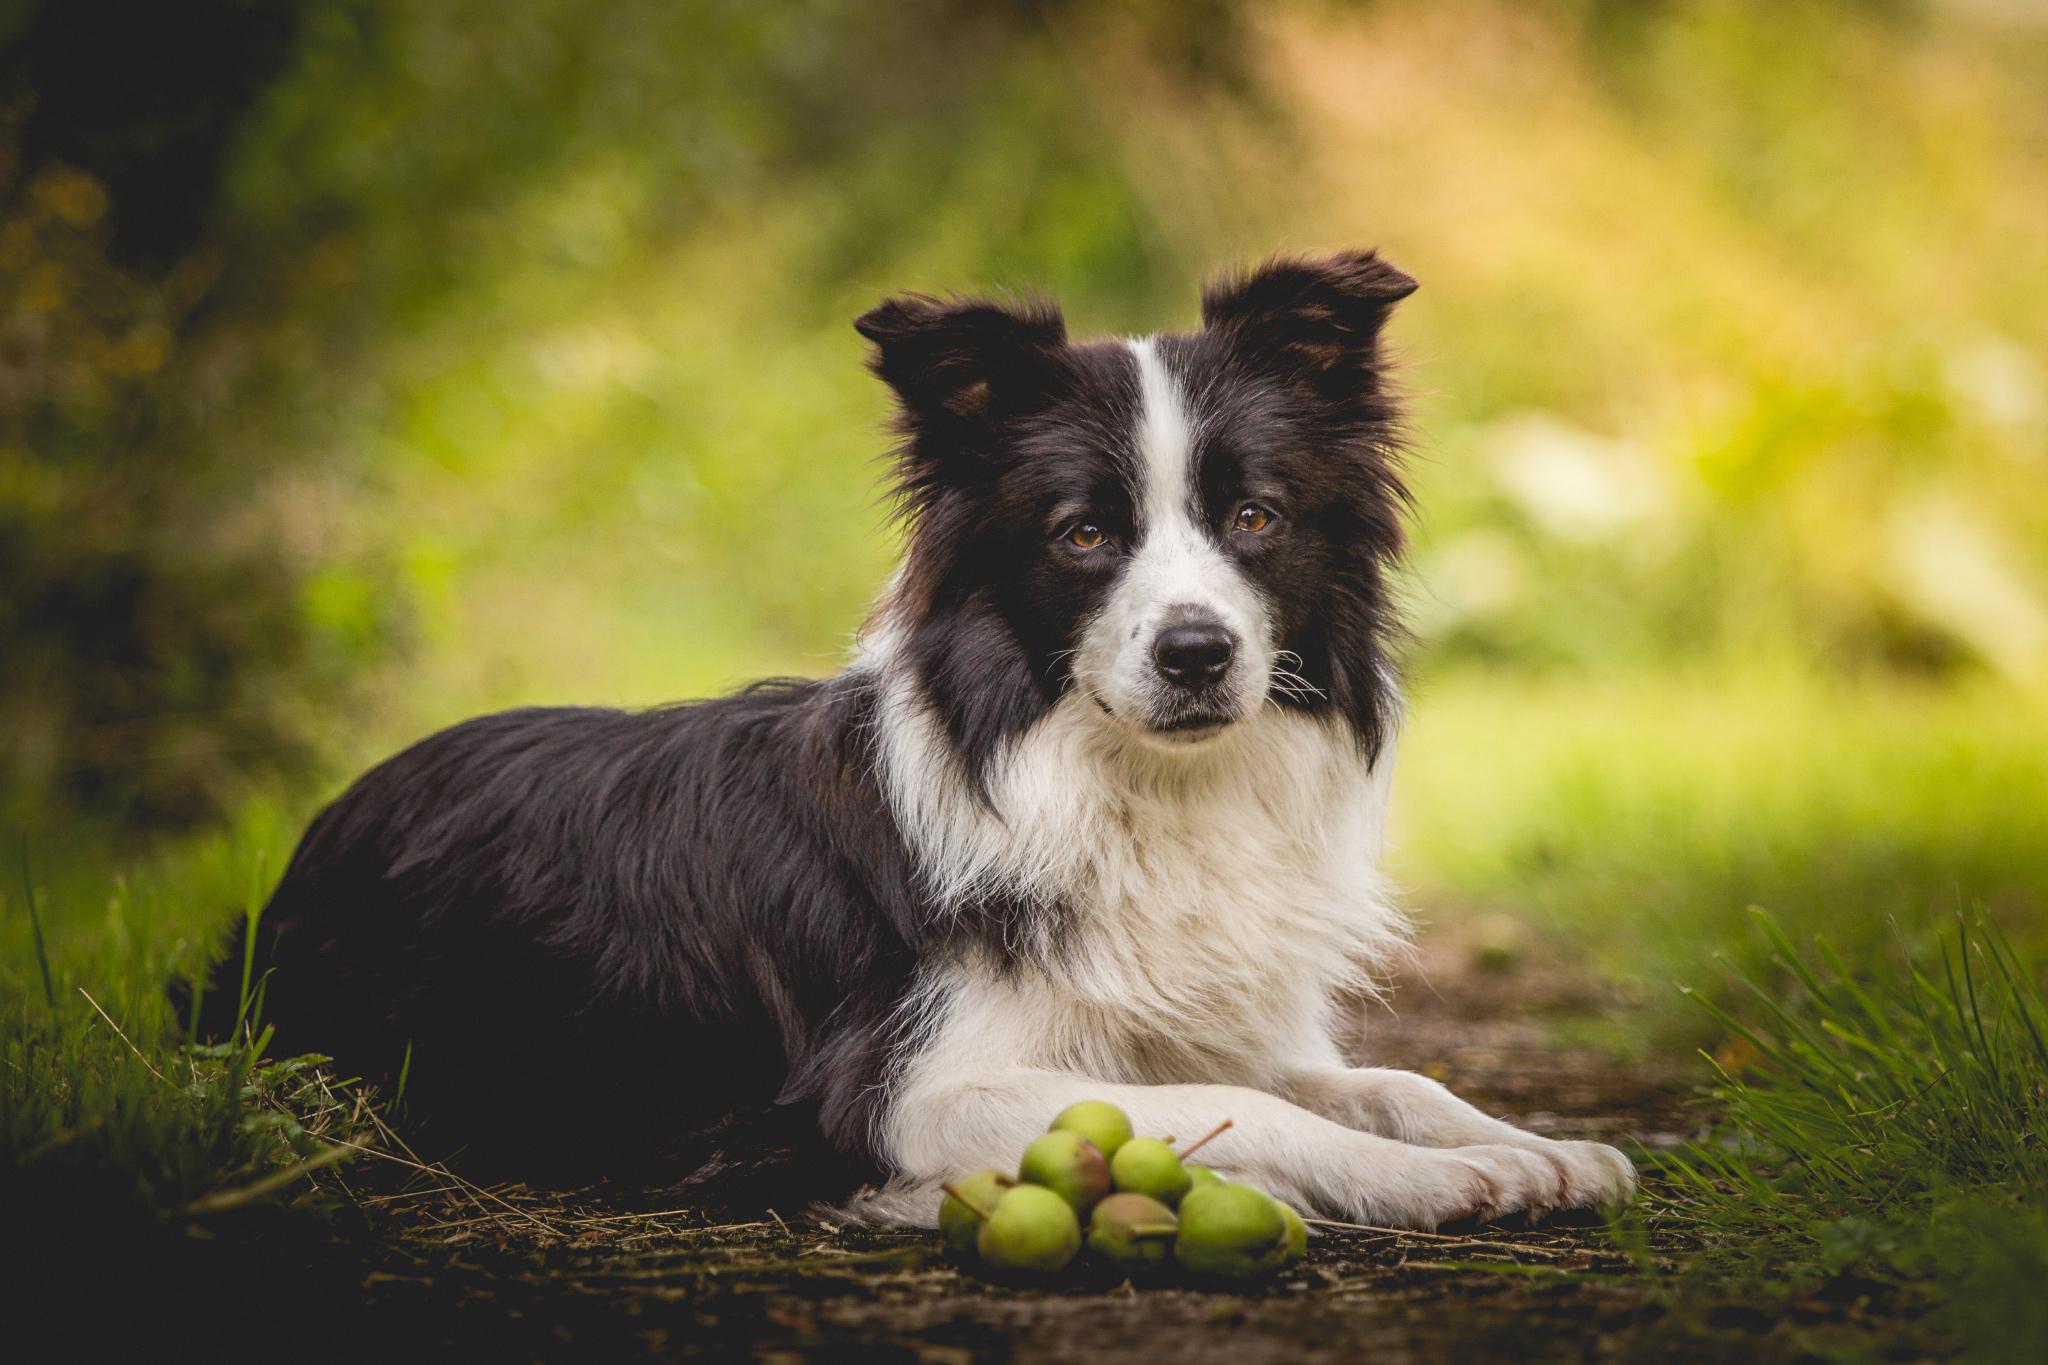 Border Collie Hündin Ida mit grünen Äpfeln